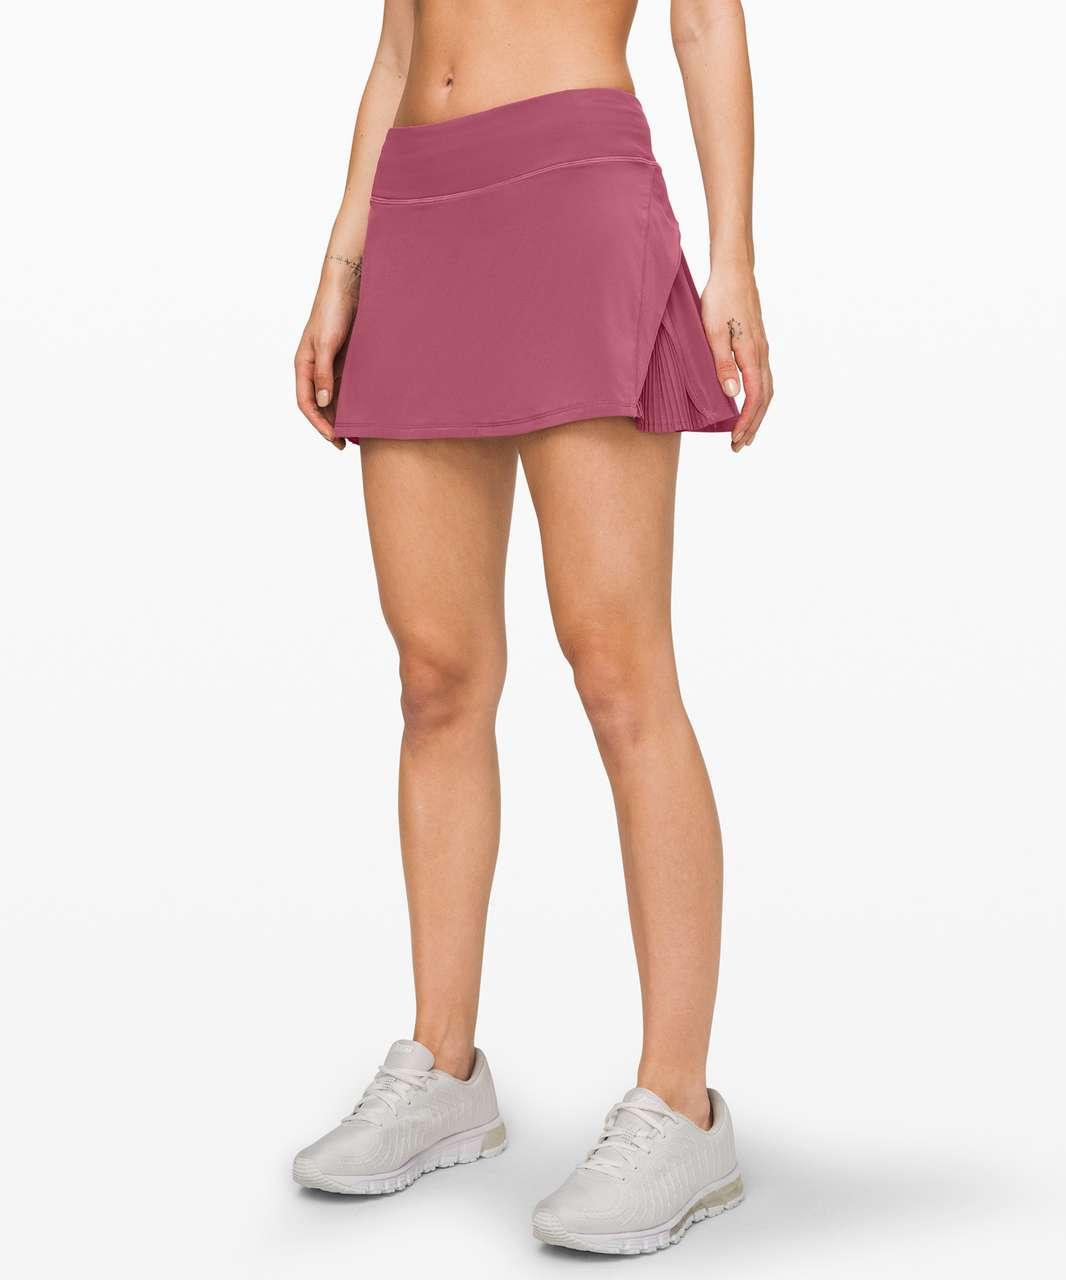 "Lululemon Play Off The Pleats Skirt *13"" - Plumful"